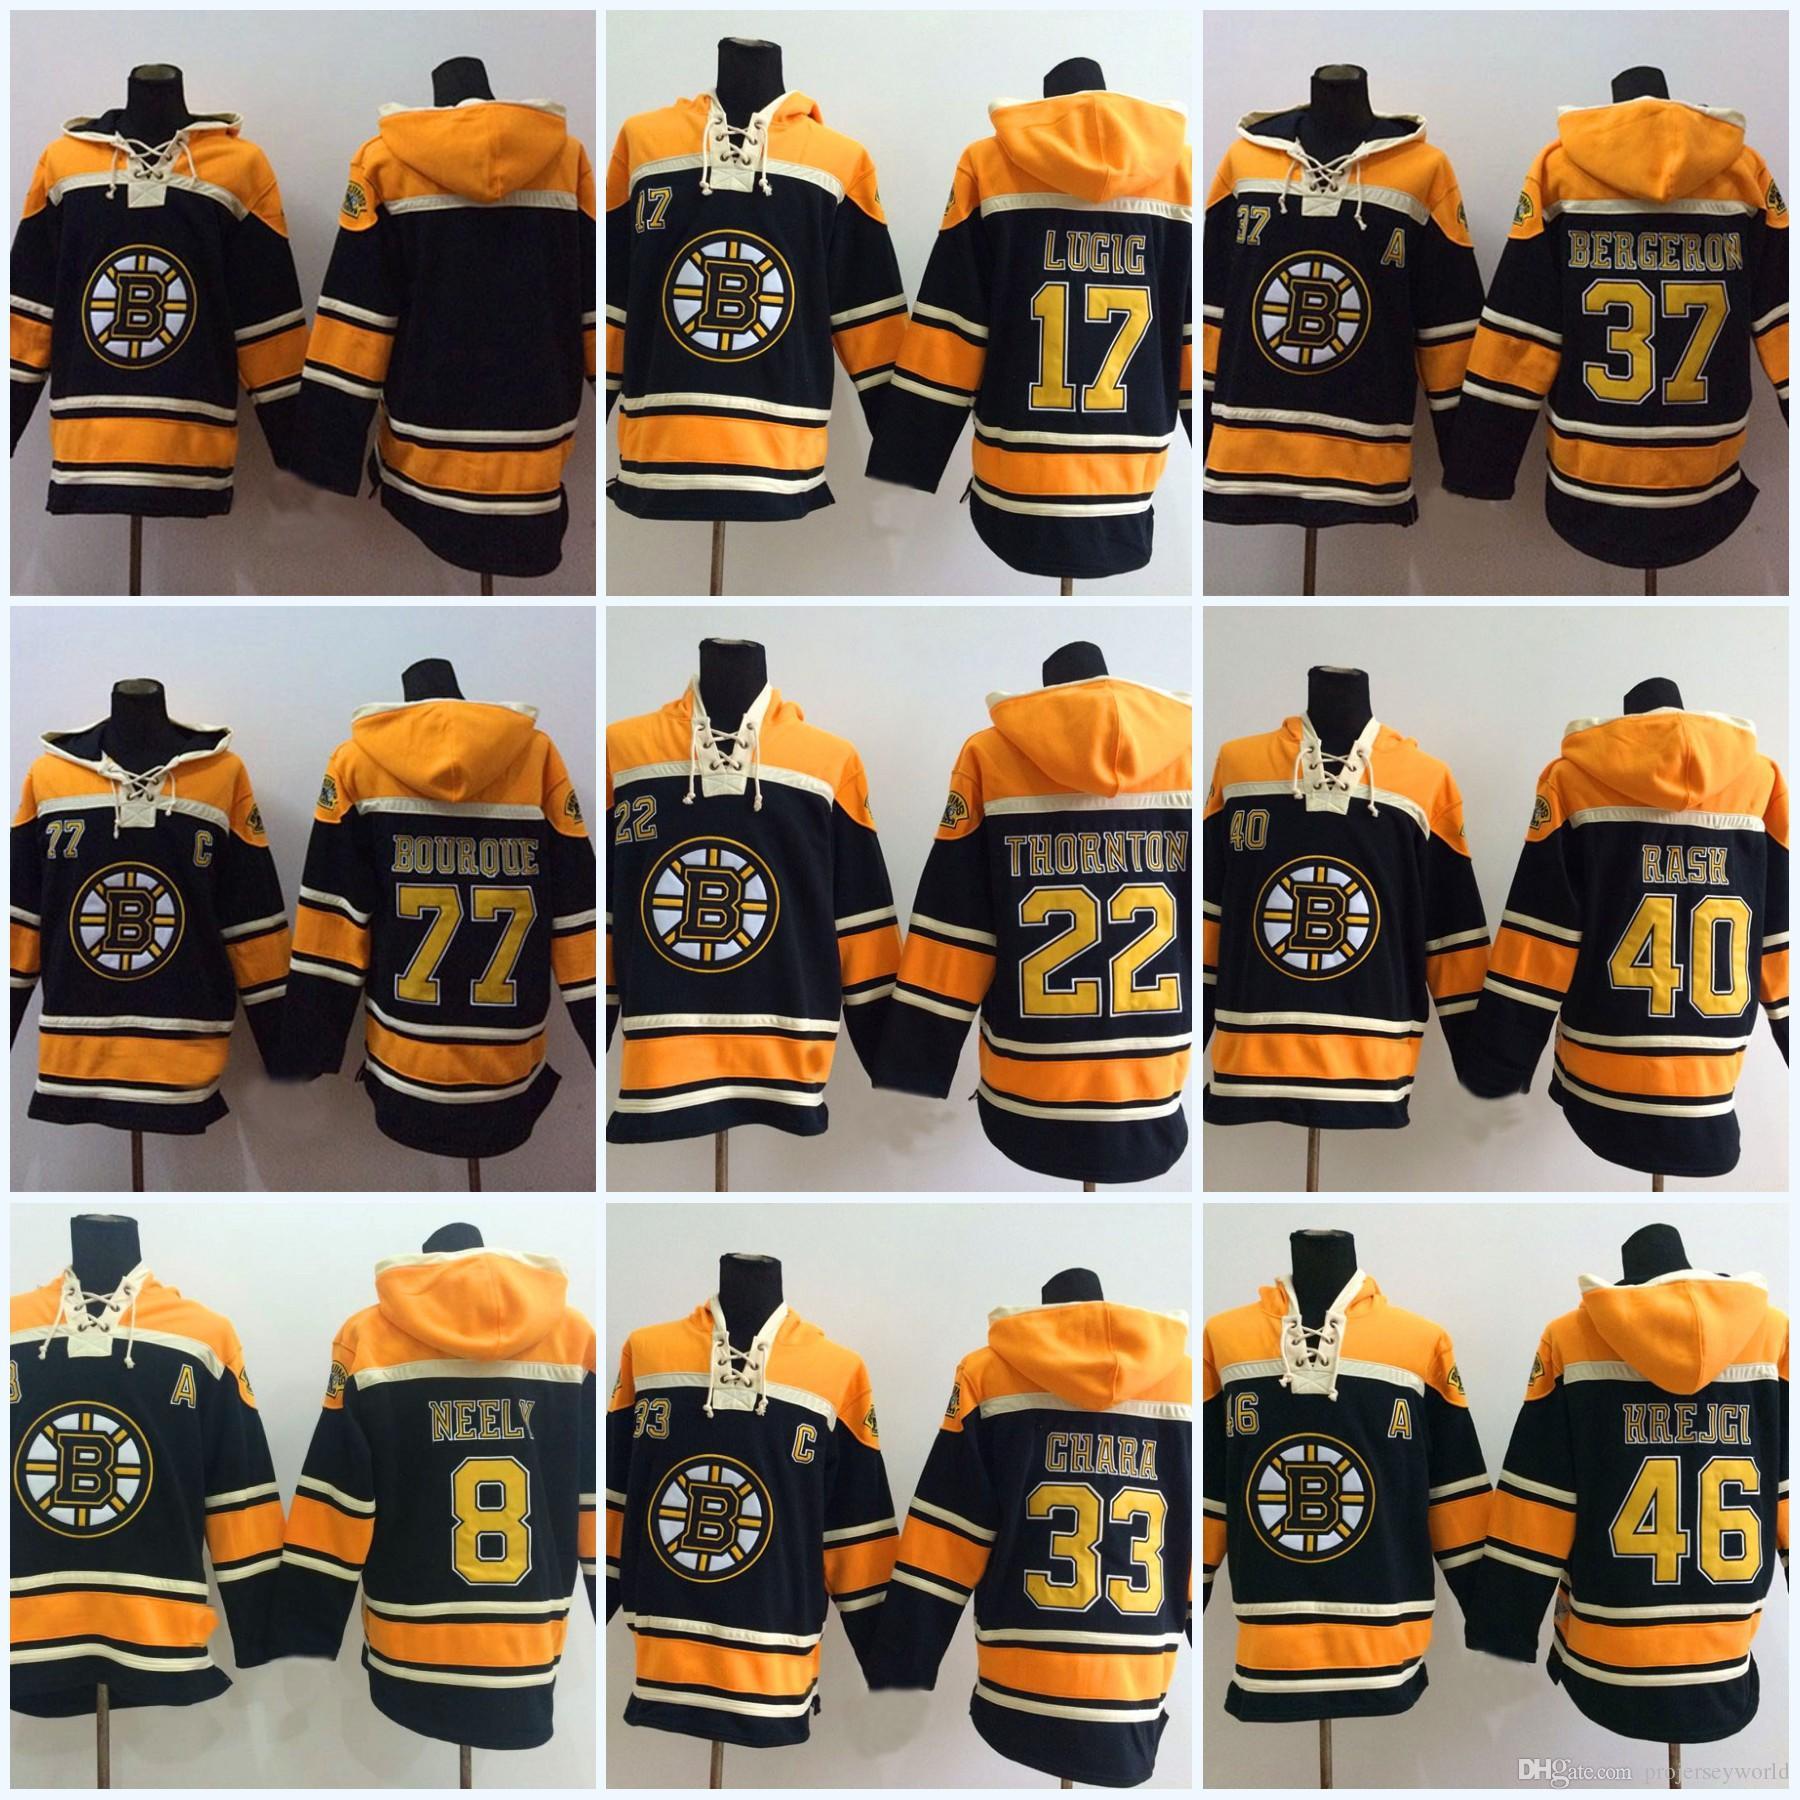 e6bd972bee1 Acquista 40 Tuukka Rask Boston Bruins Jersey 8 Cam Neely 17 Milan Lucic 22  Shawn Thornton 46 David Krejci Felpa Con Cappuccio Da Uomo Maglia Da Hockey  A ...